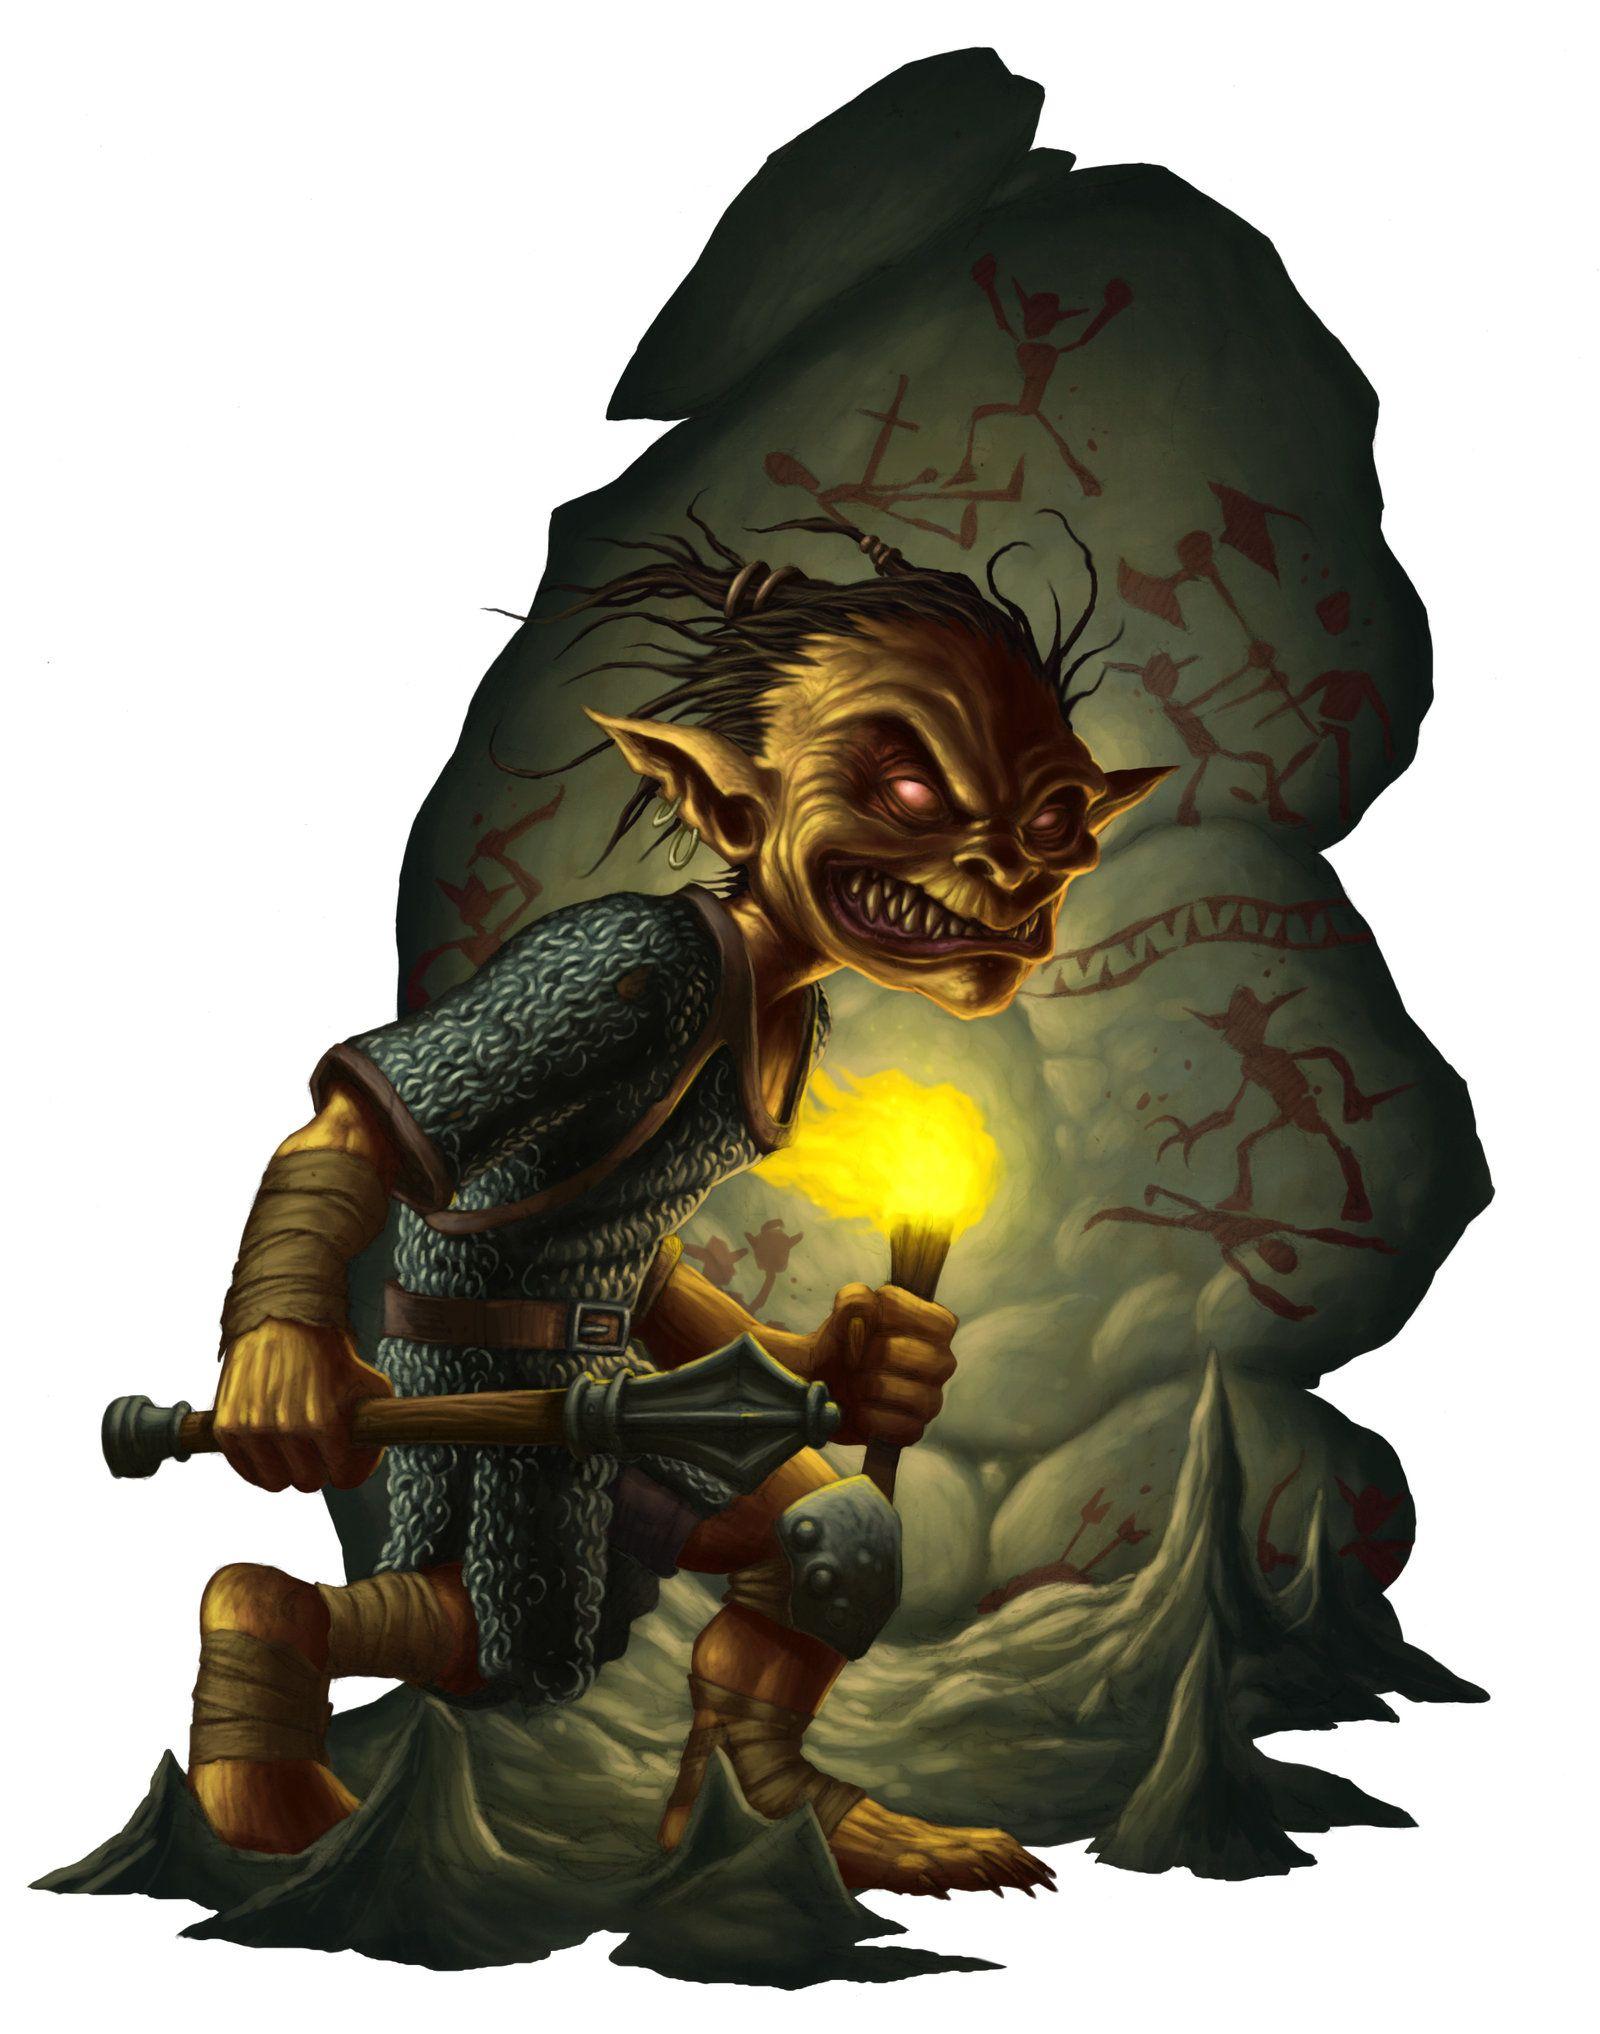 Mystical creatures: monsters, spirits, goblin, brownie